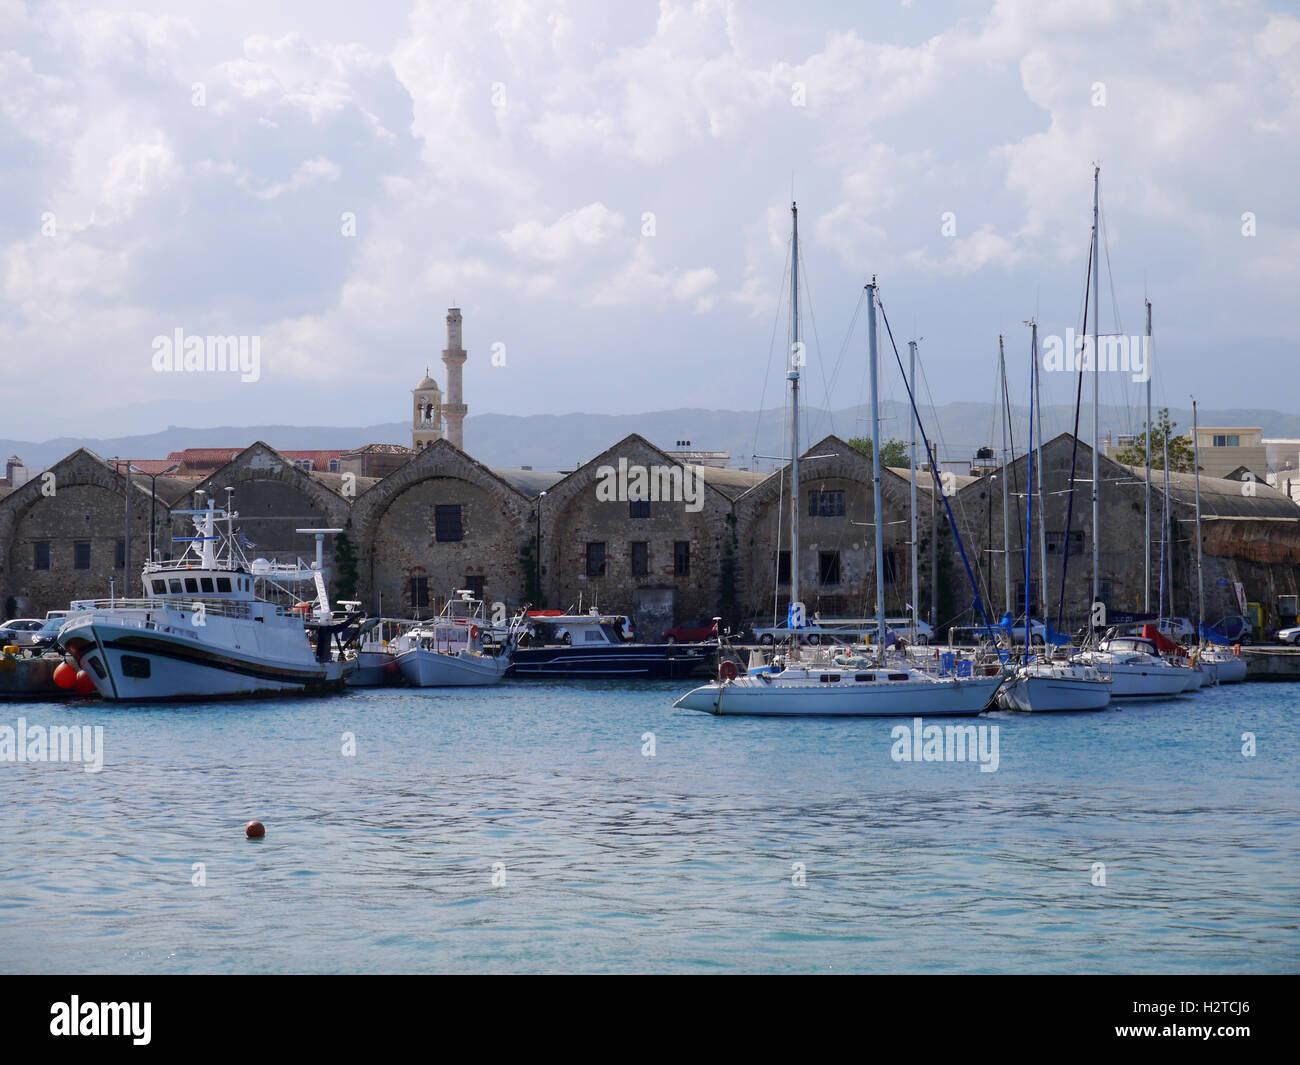 Harbor in Cahnia, Western Crete, Greece - Stock Image